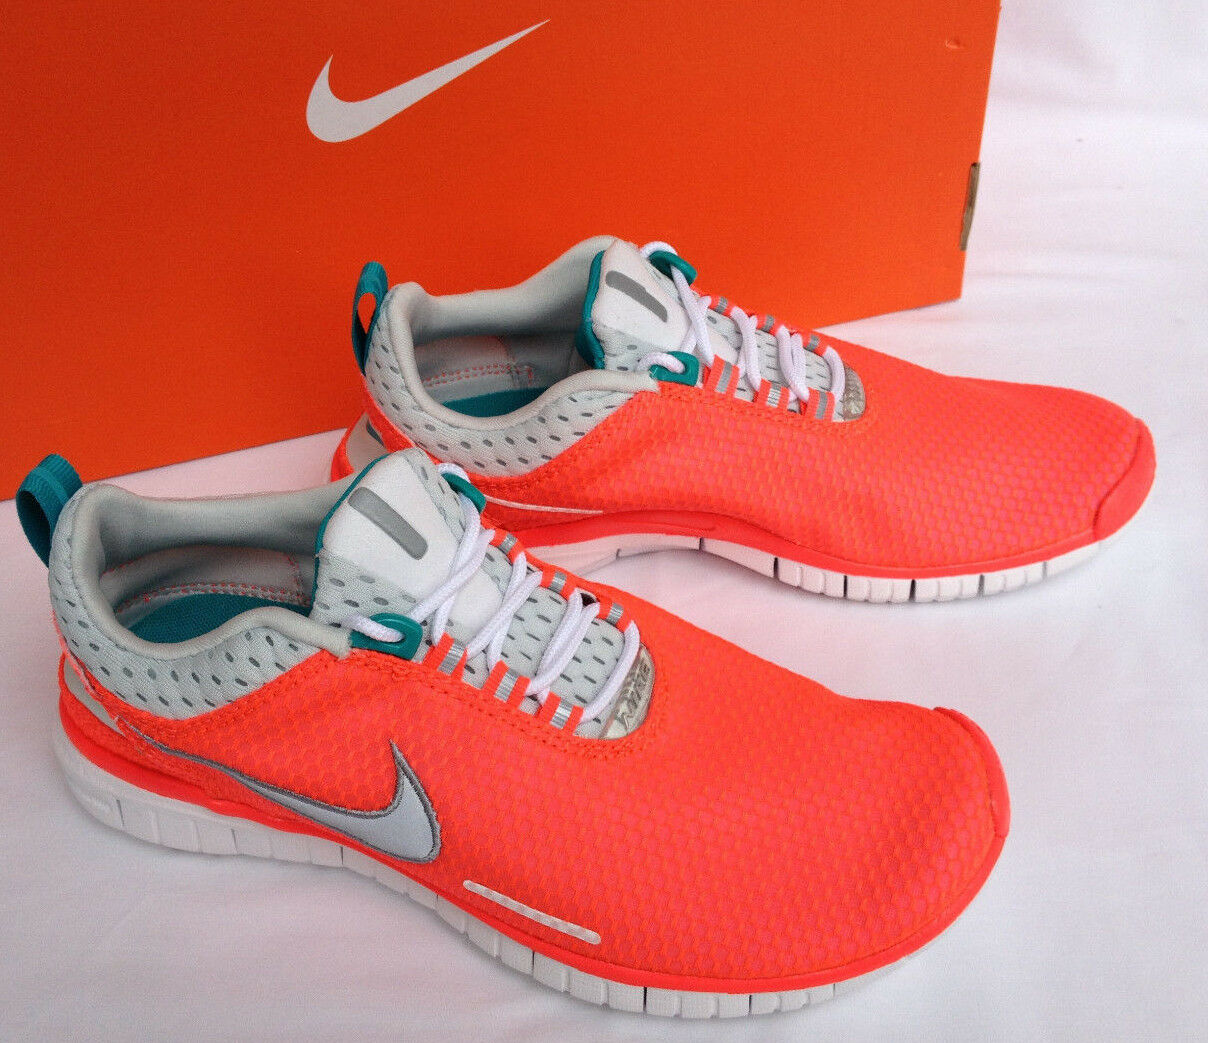 new Nike Free OG Breeze 644450-600 Lazer Crimson Marathon Running Shoes Womens 9